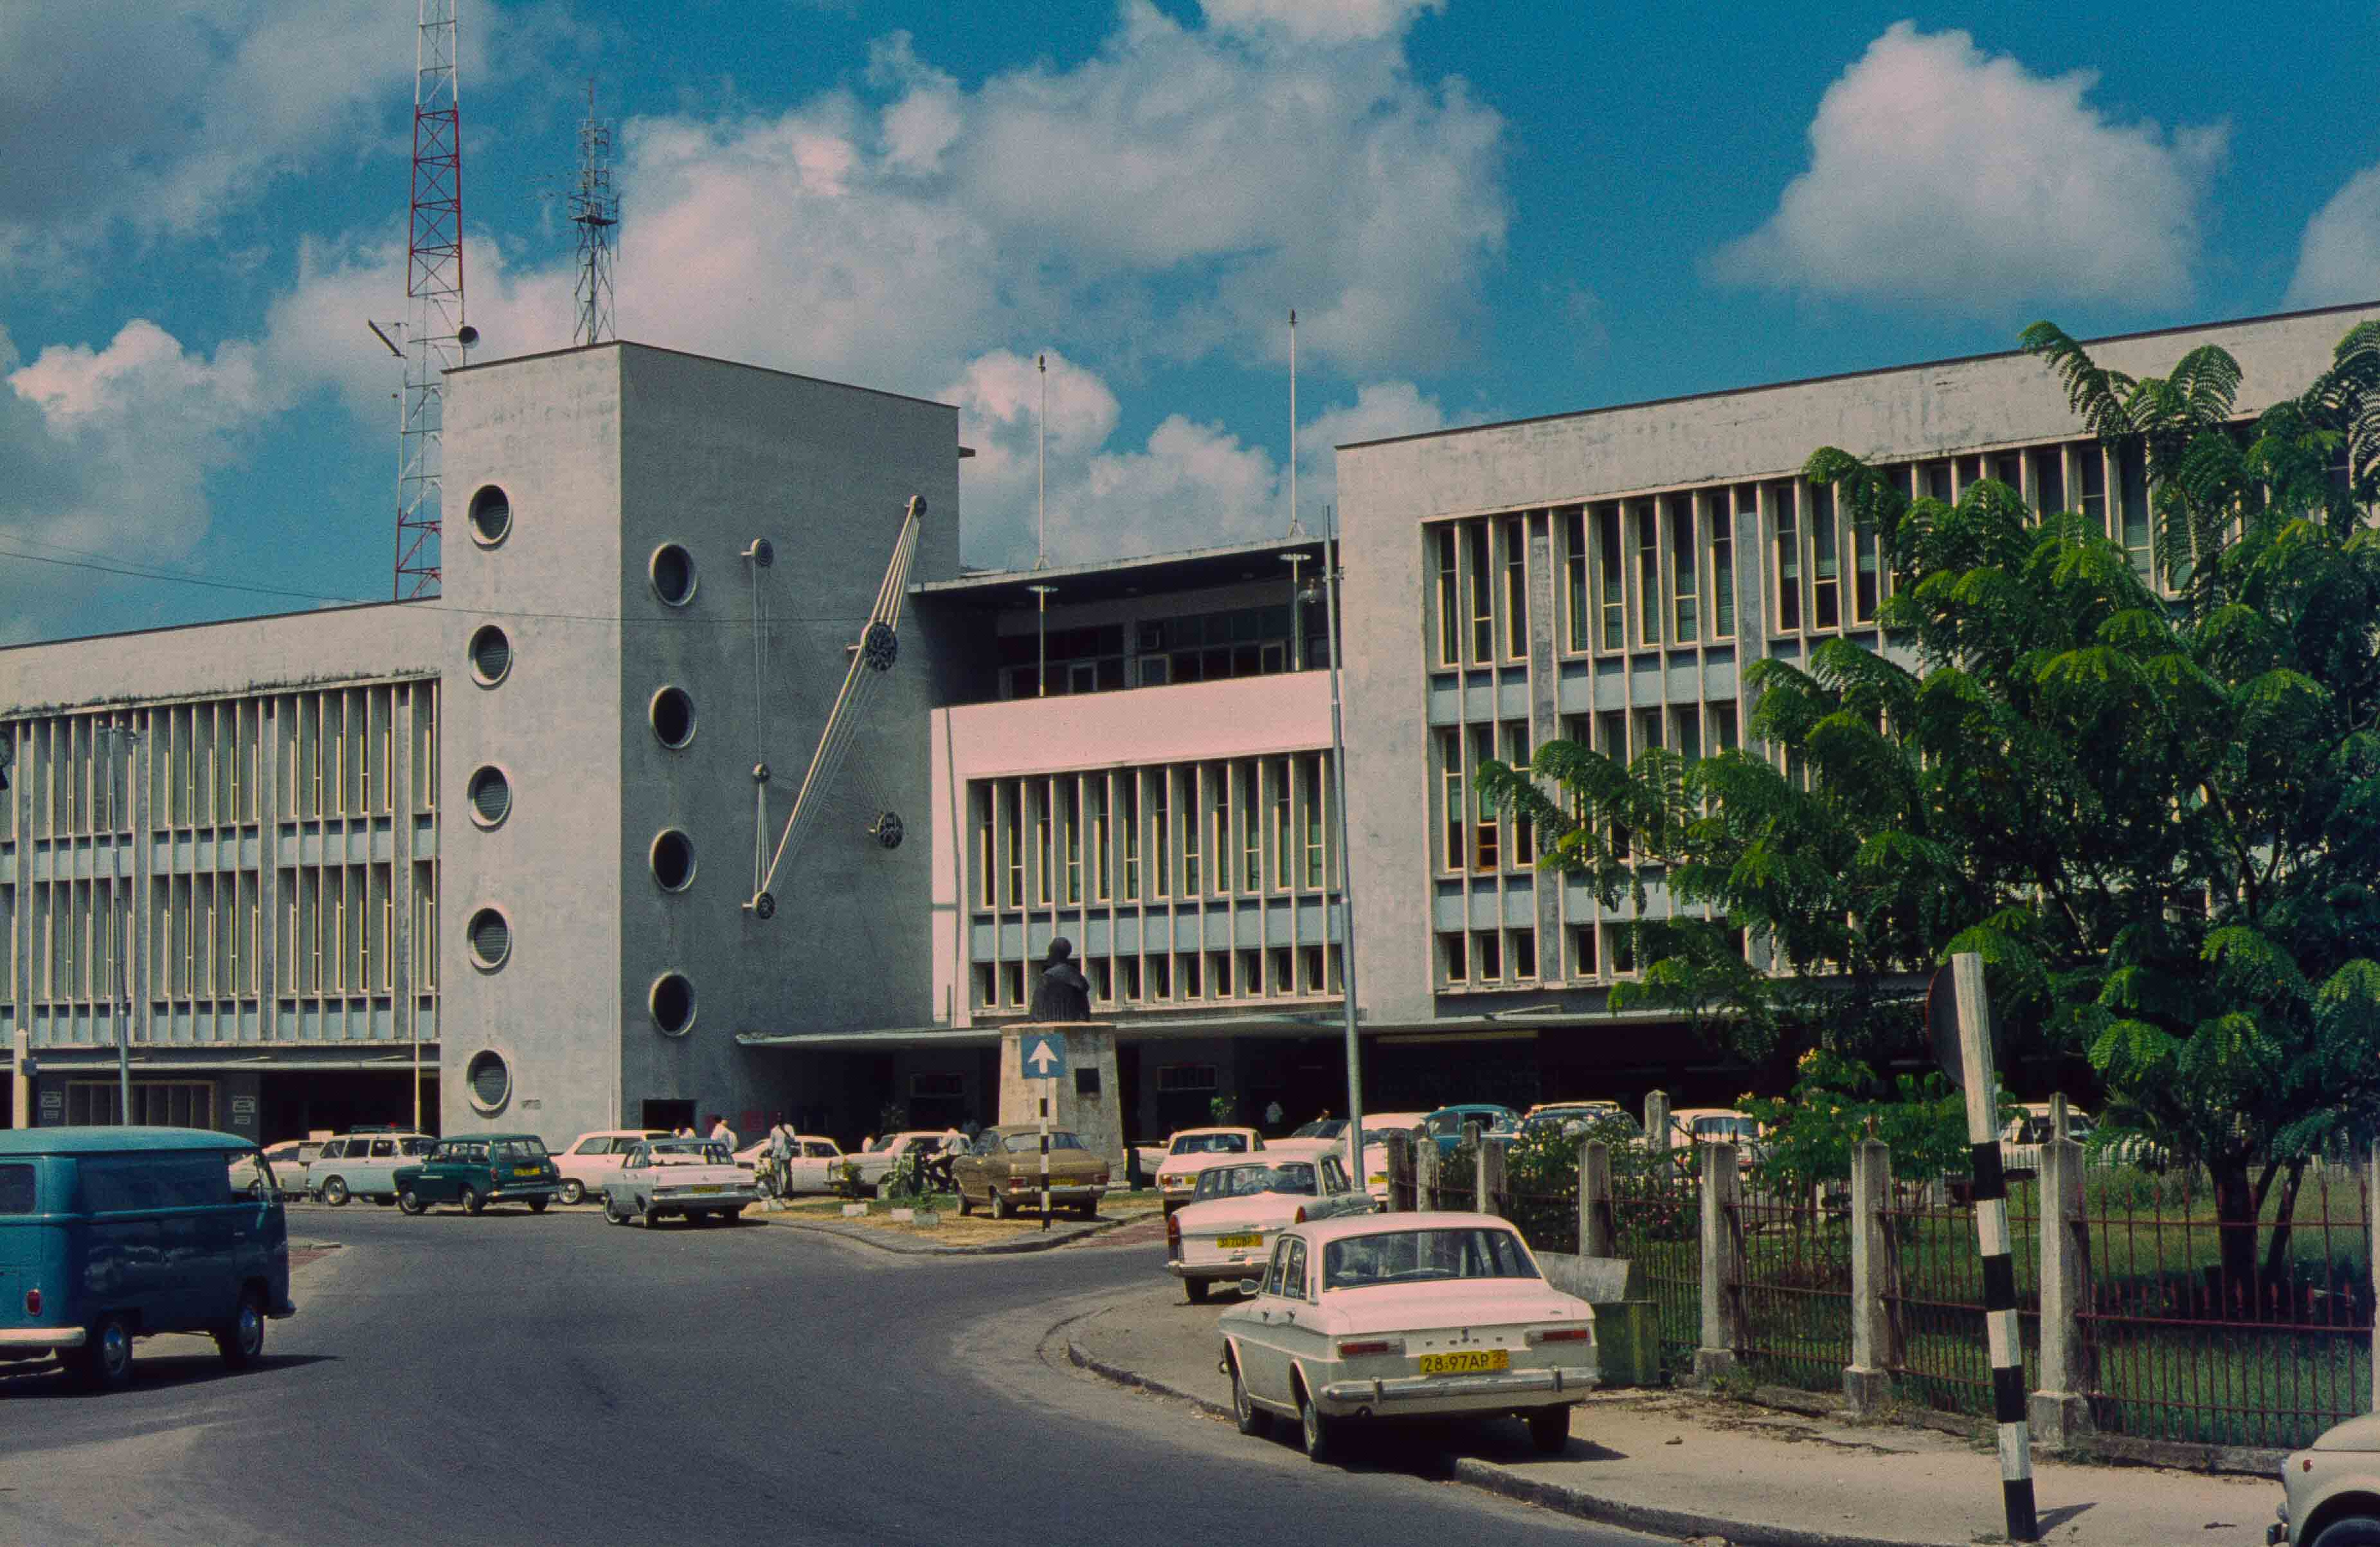 145. Suriname